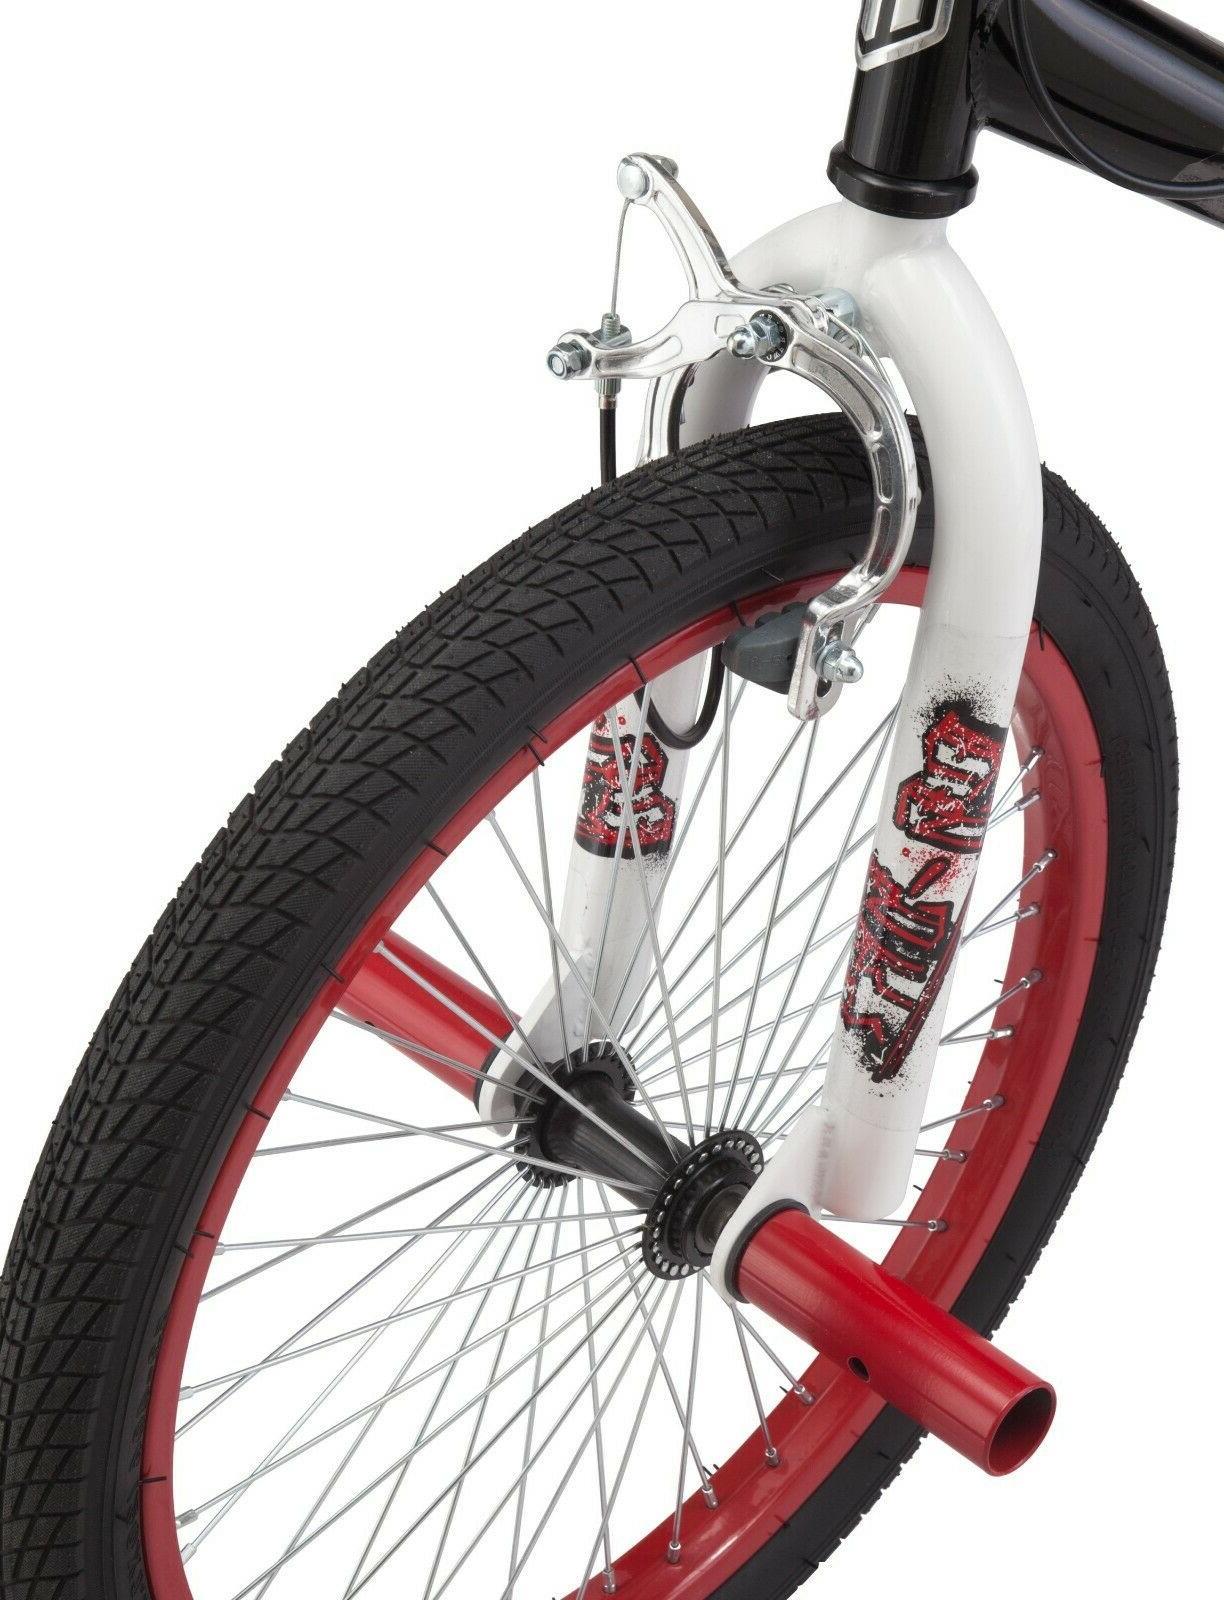 Mongoose FS BMX style Bicycle 20-inch Wheel Boys Black